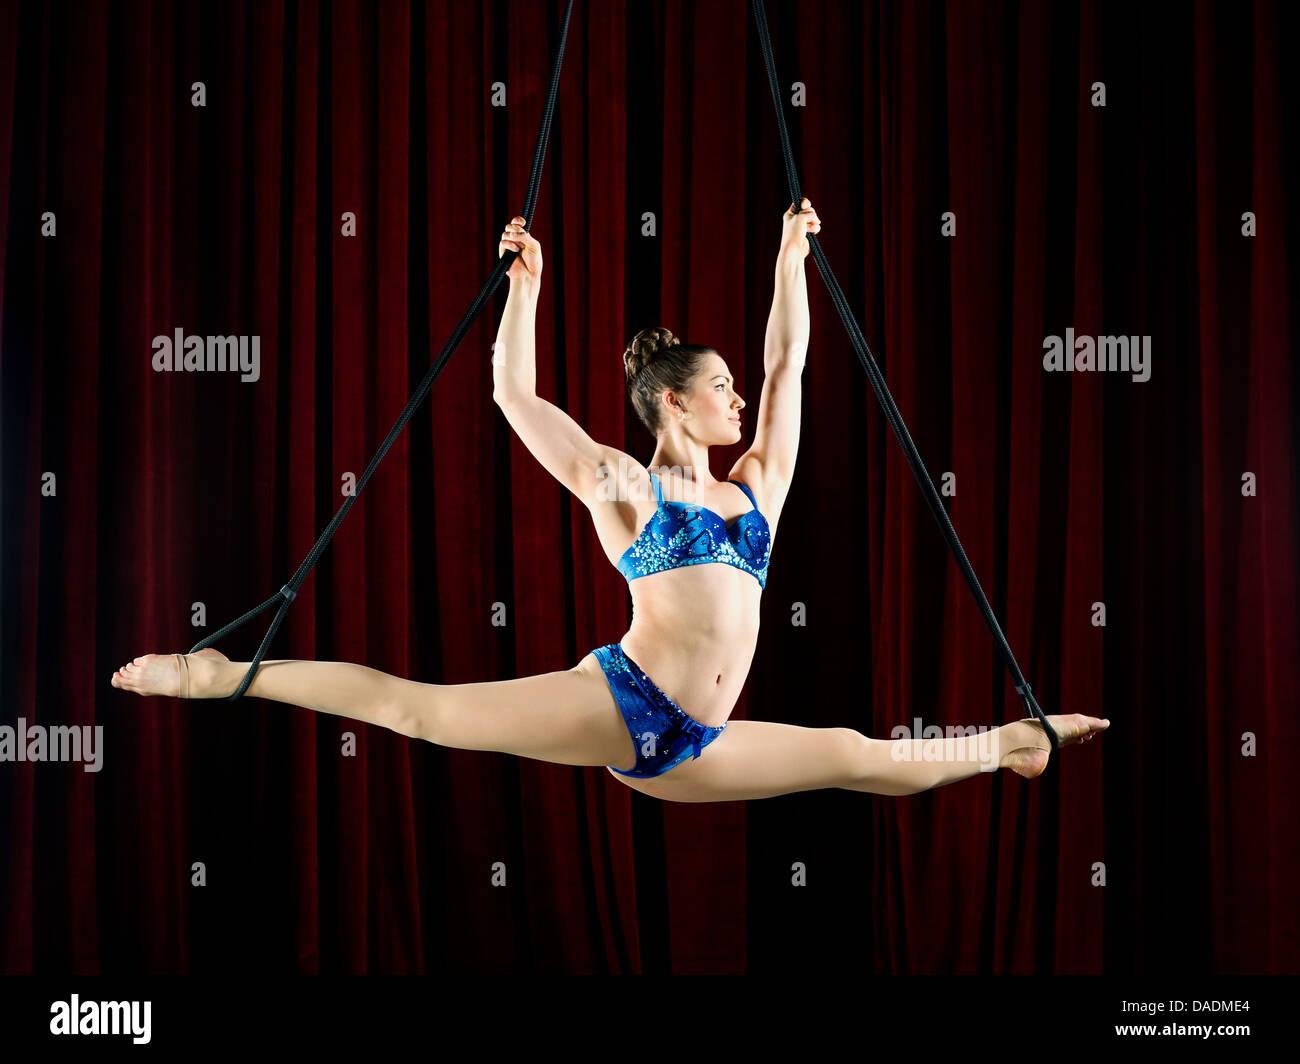 Studio shot of female aerialist performing splits on ropes - Stock Image